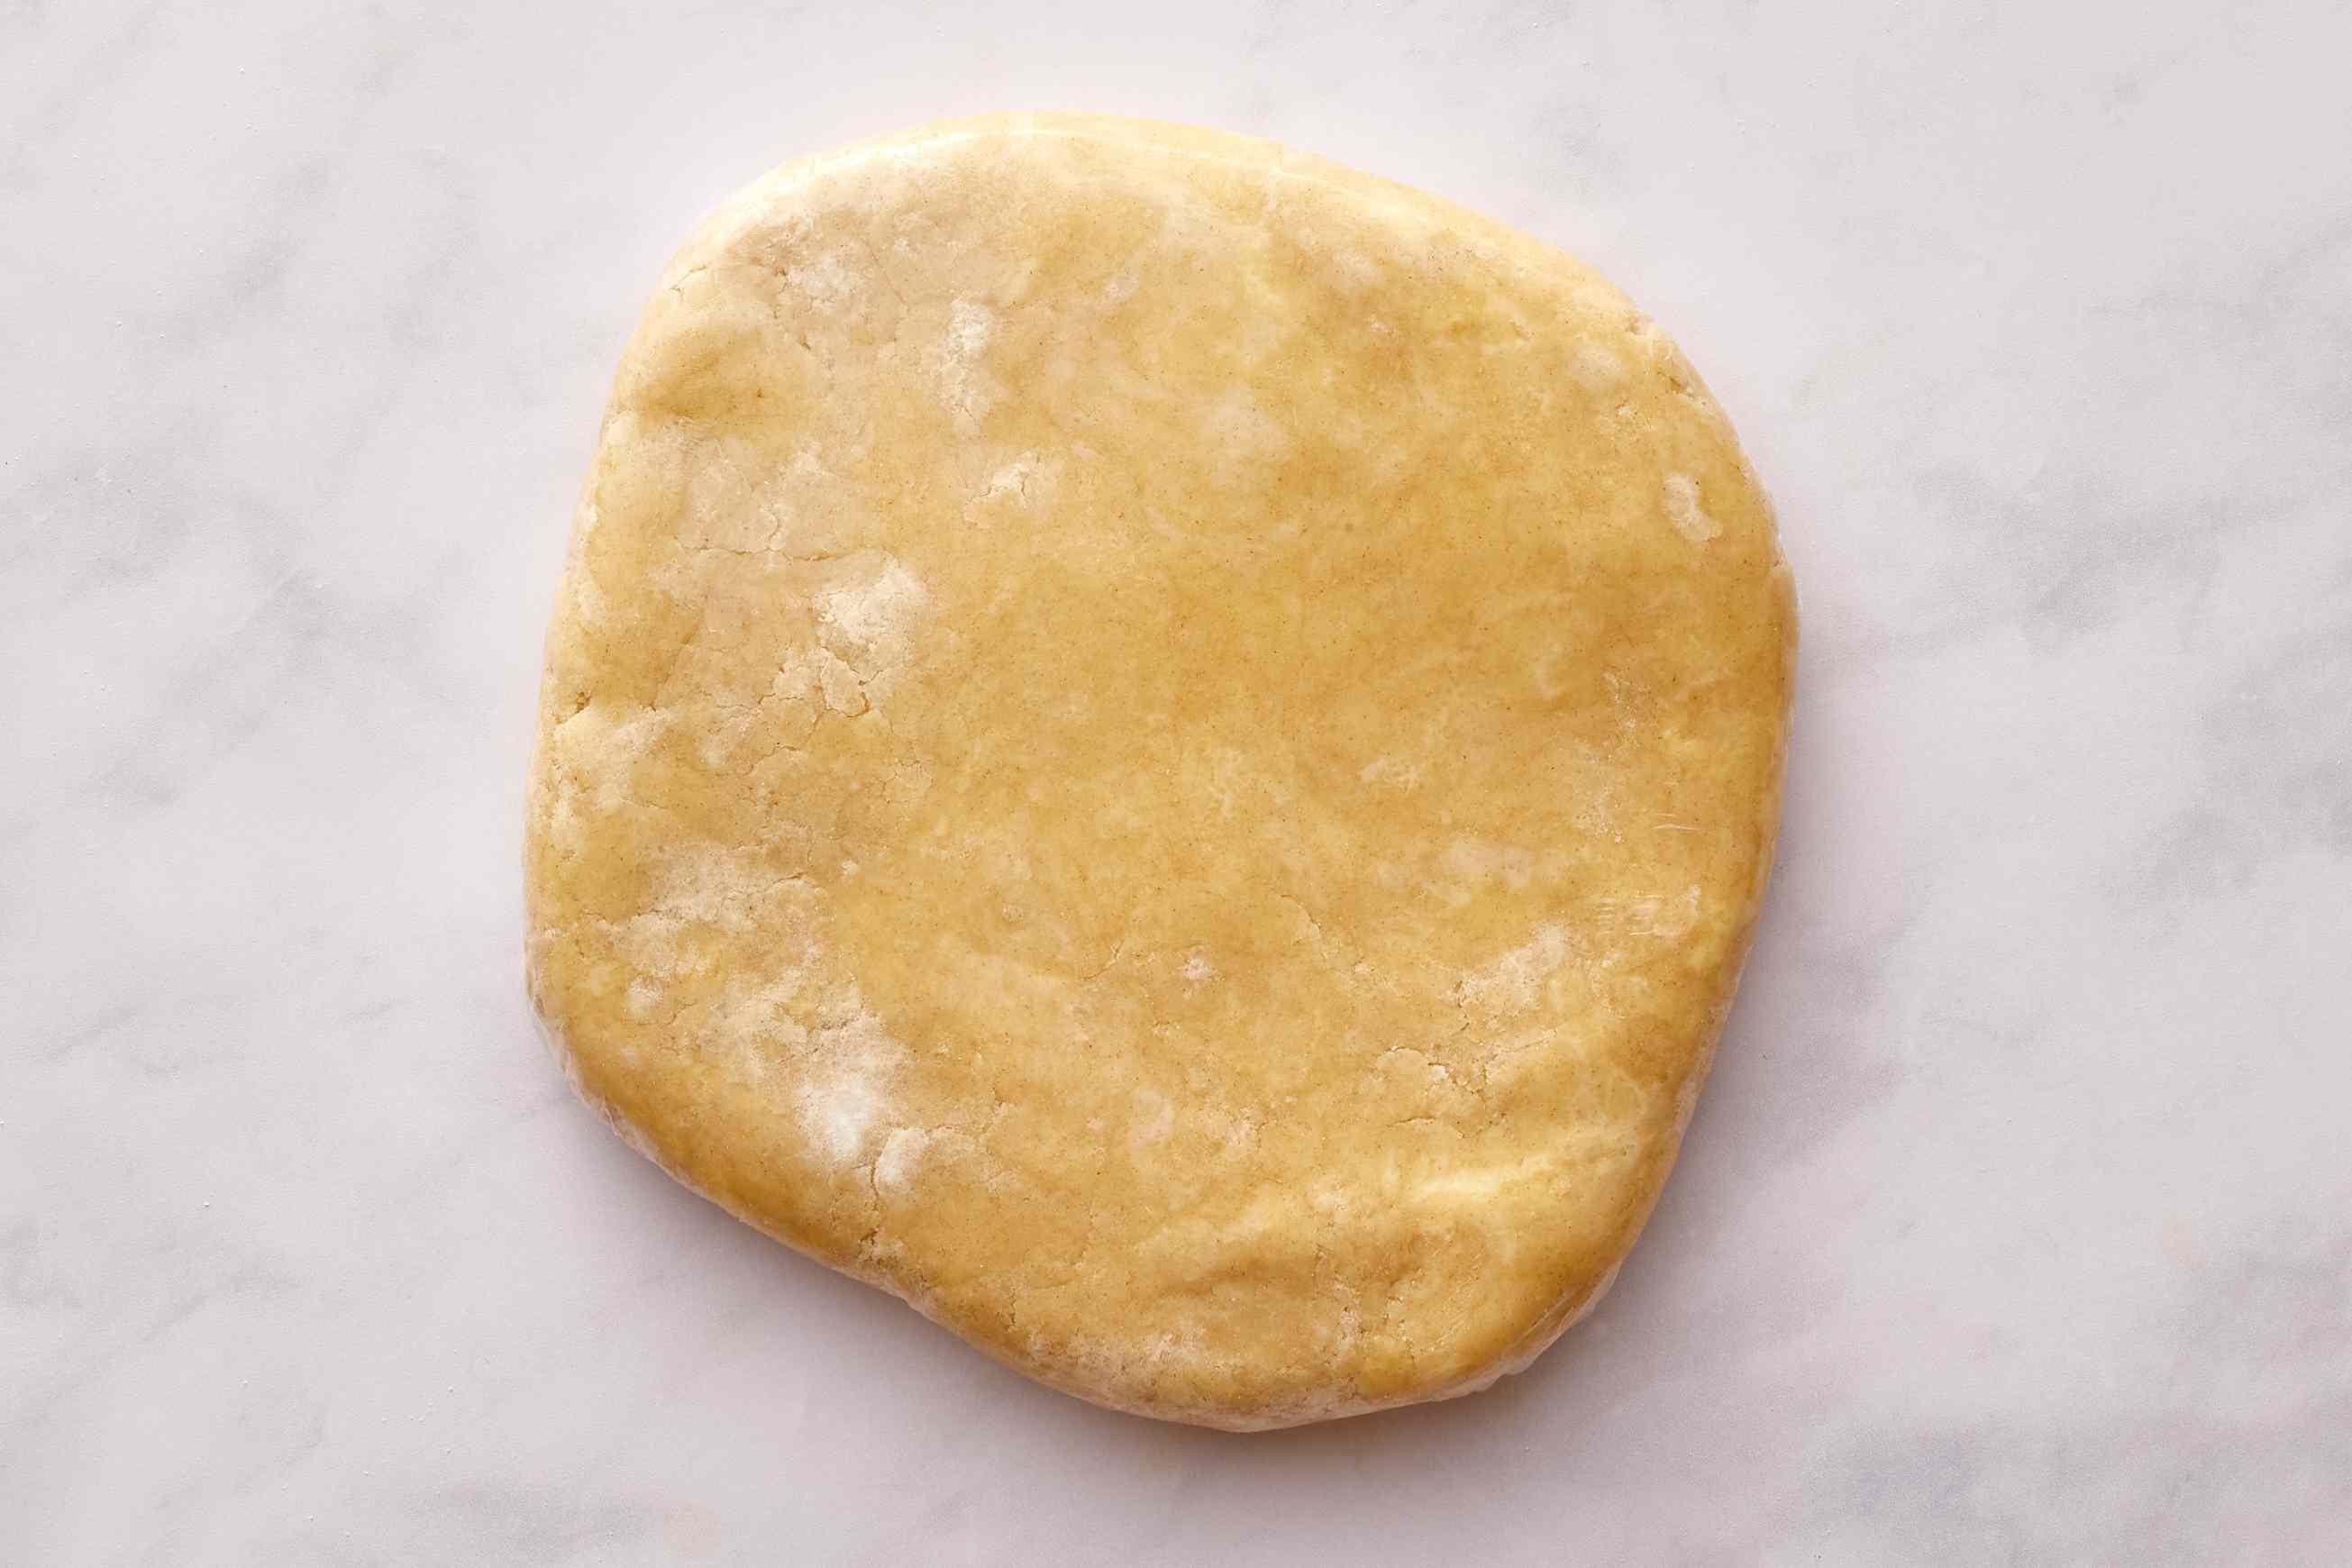 Buttery Flaky Pie Crust on a floured surface